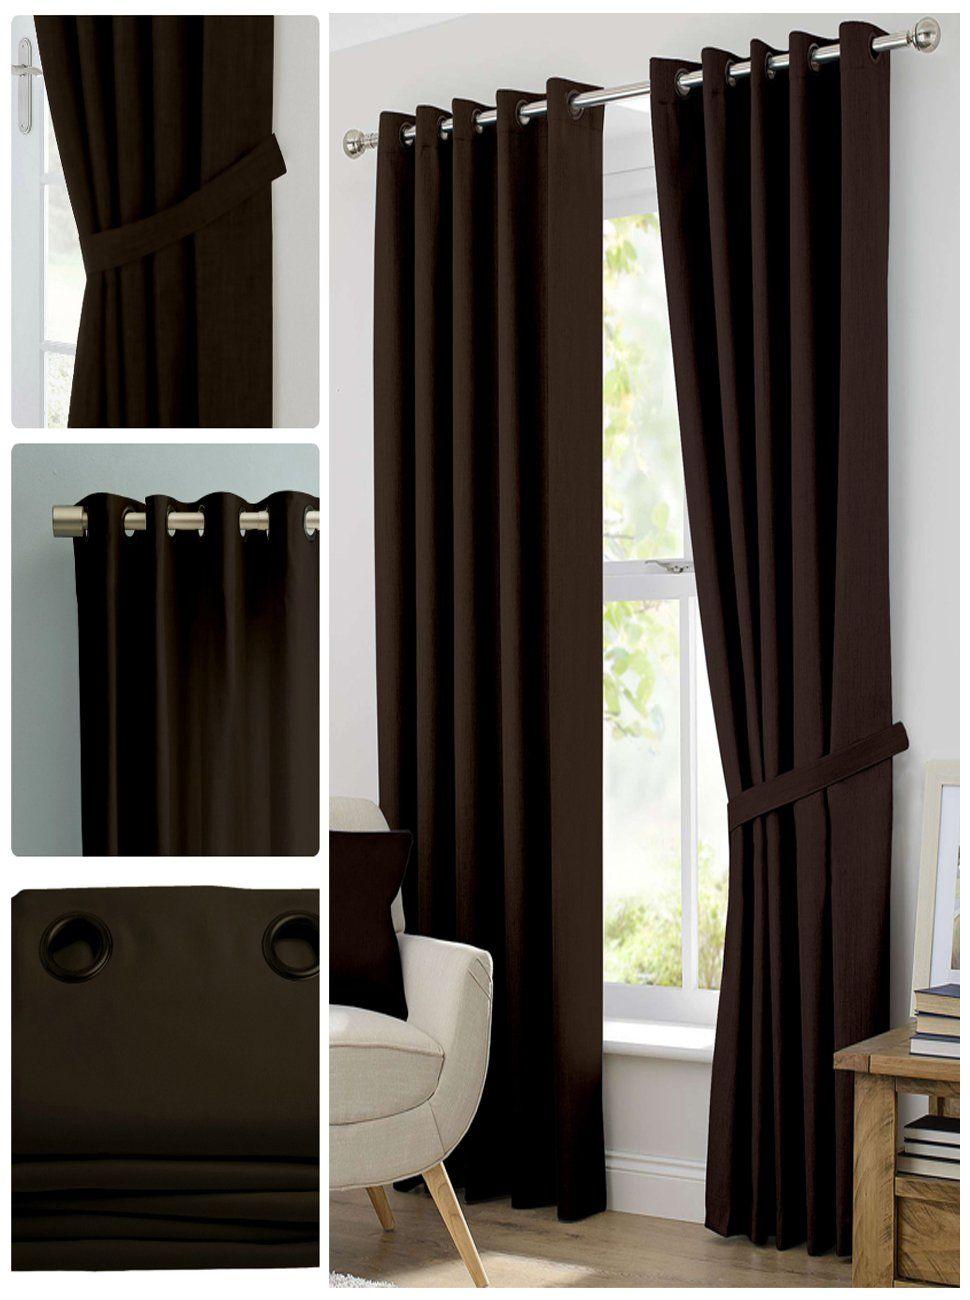 Amazon.com: Blackout Room Darkening Curtains Window Panel Drapes